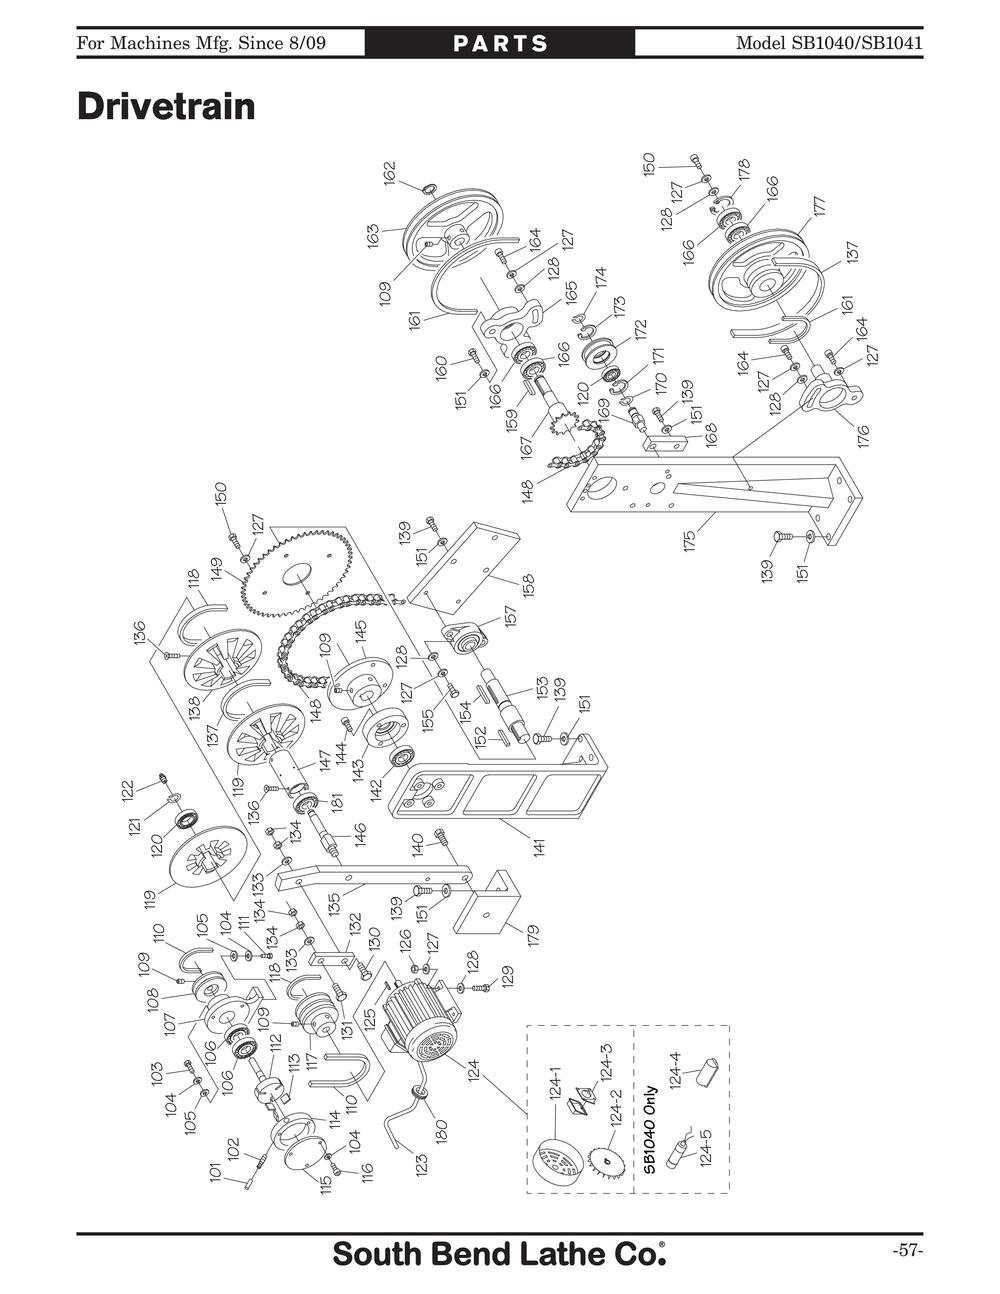 Reciprocating Saw Parts Diagram Wiring